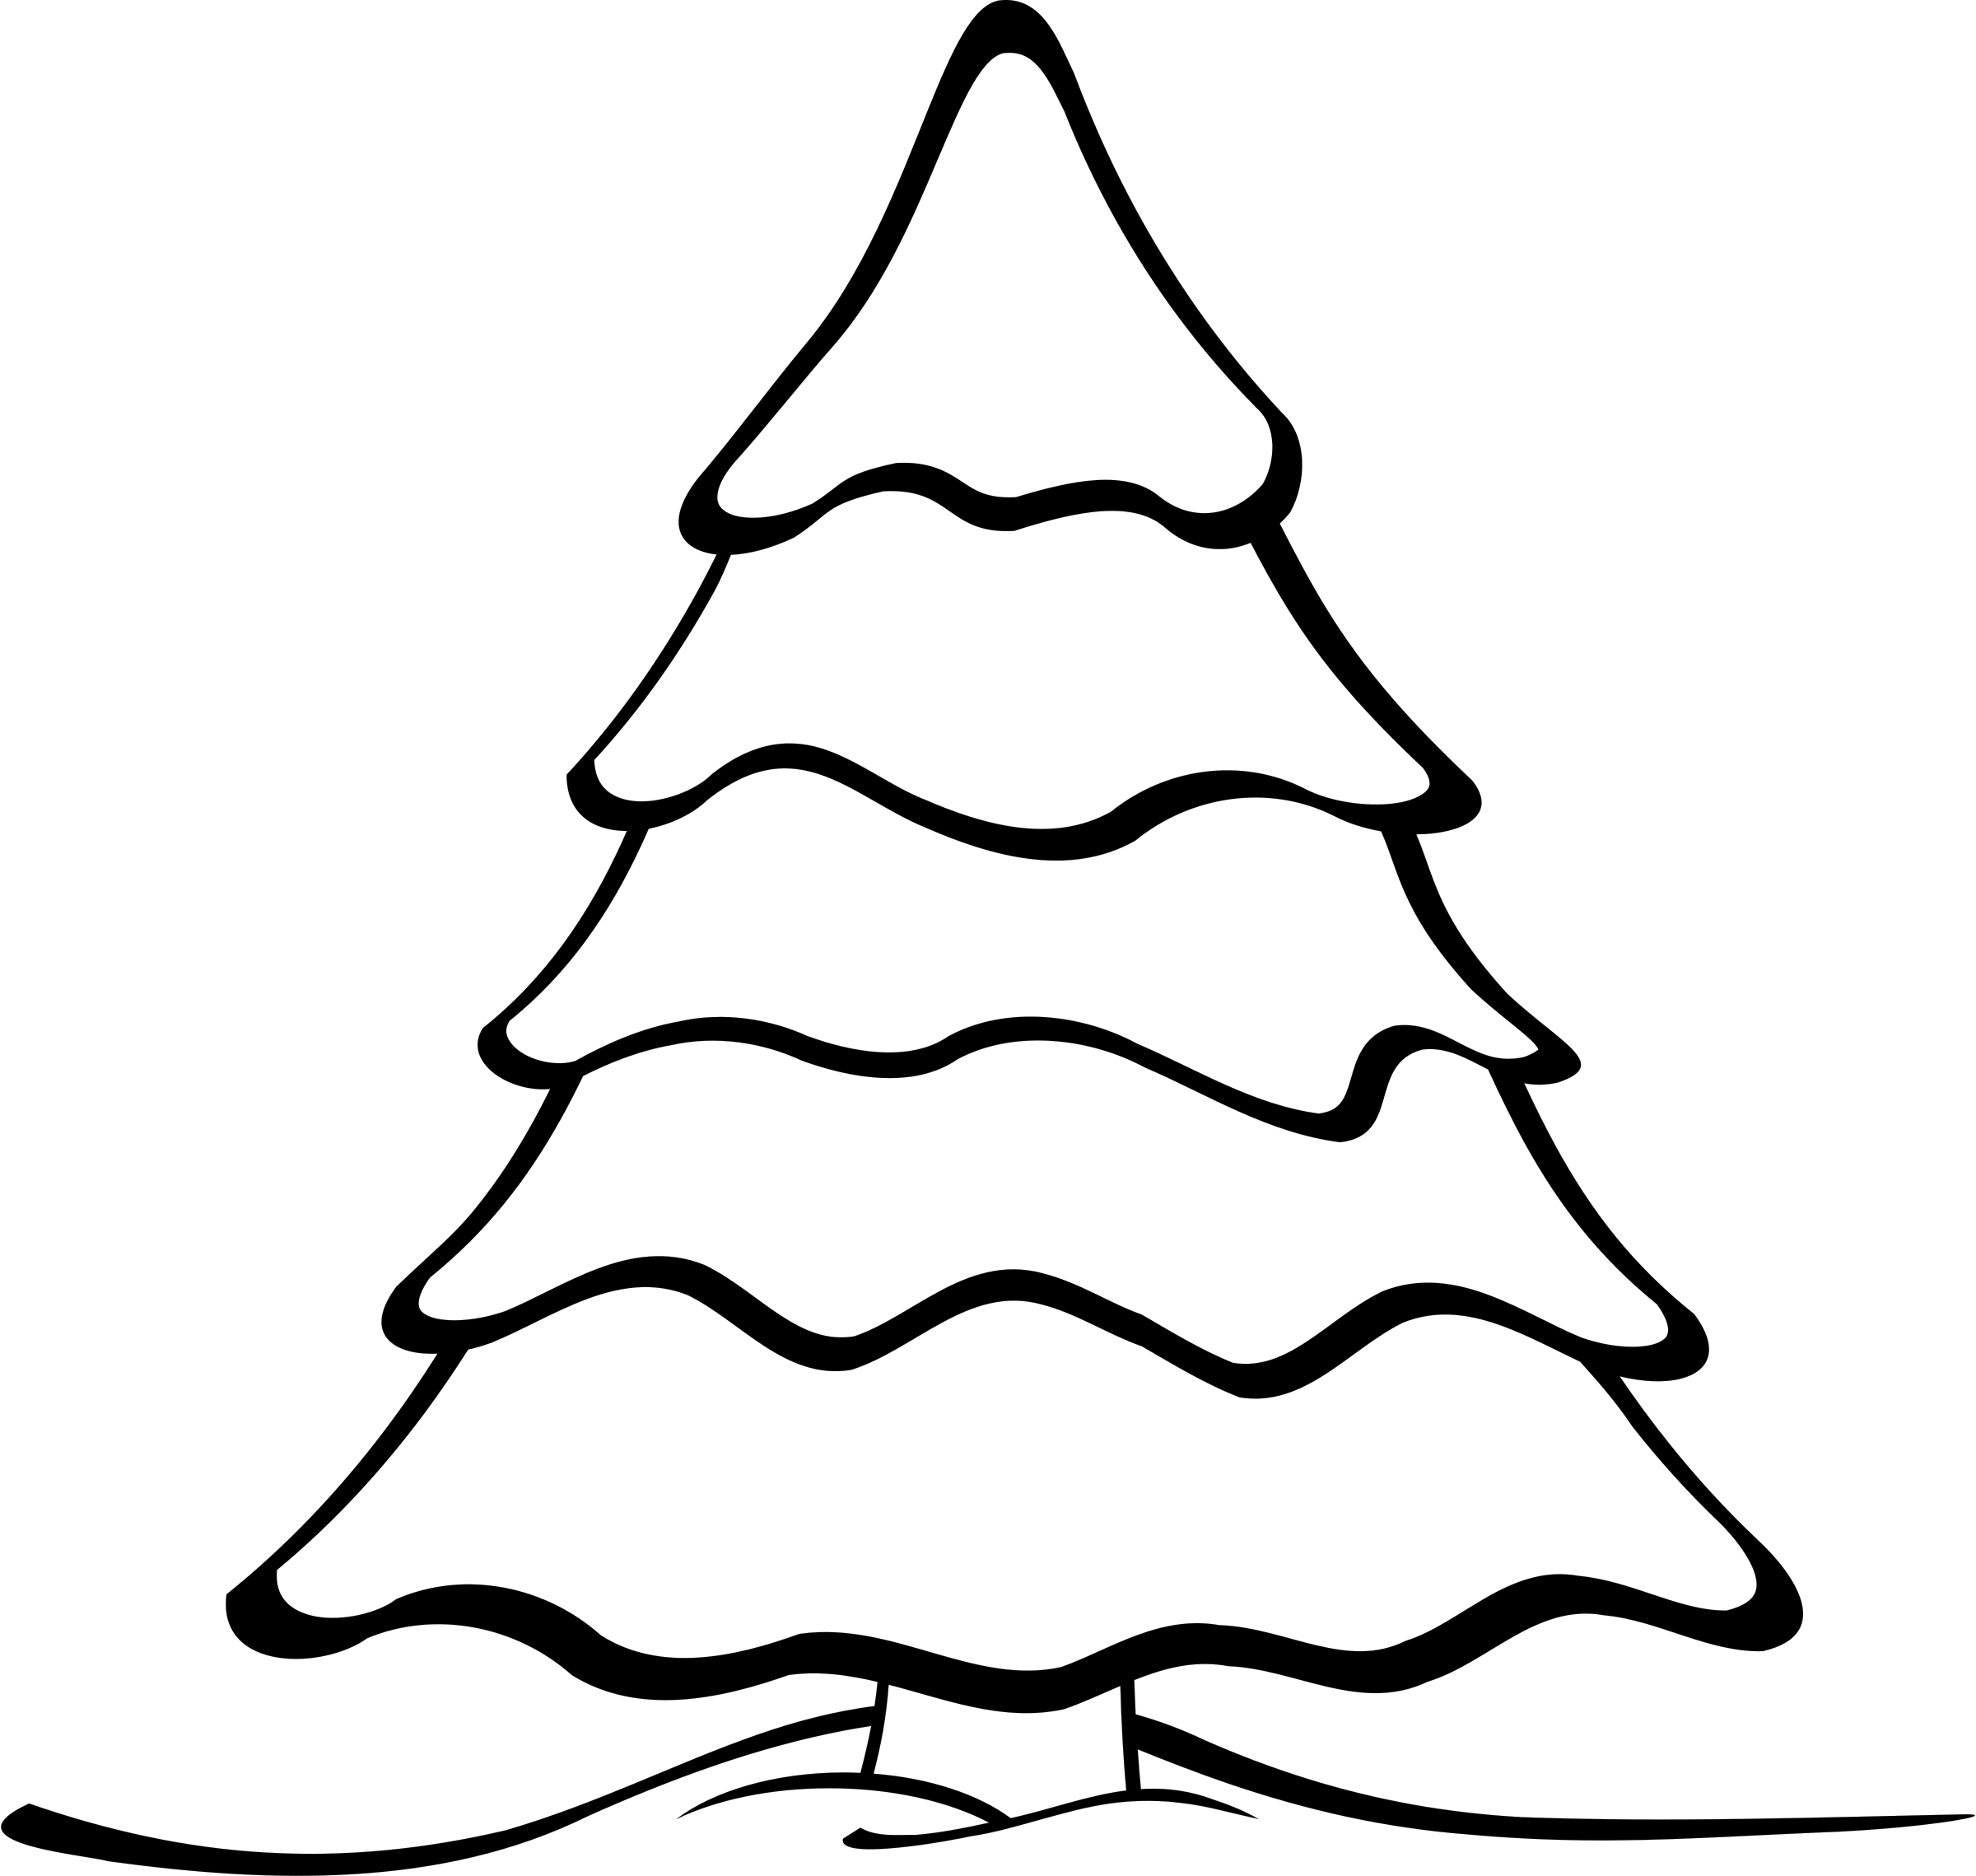 Black And White Christmas Tree Outline Christmas Ornament